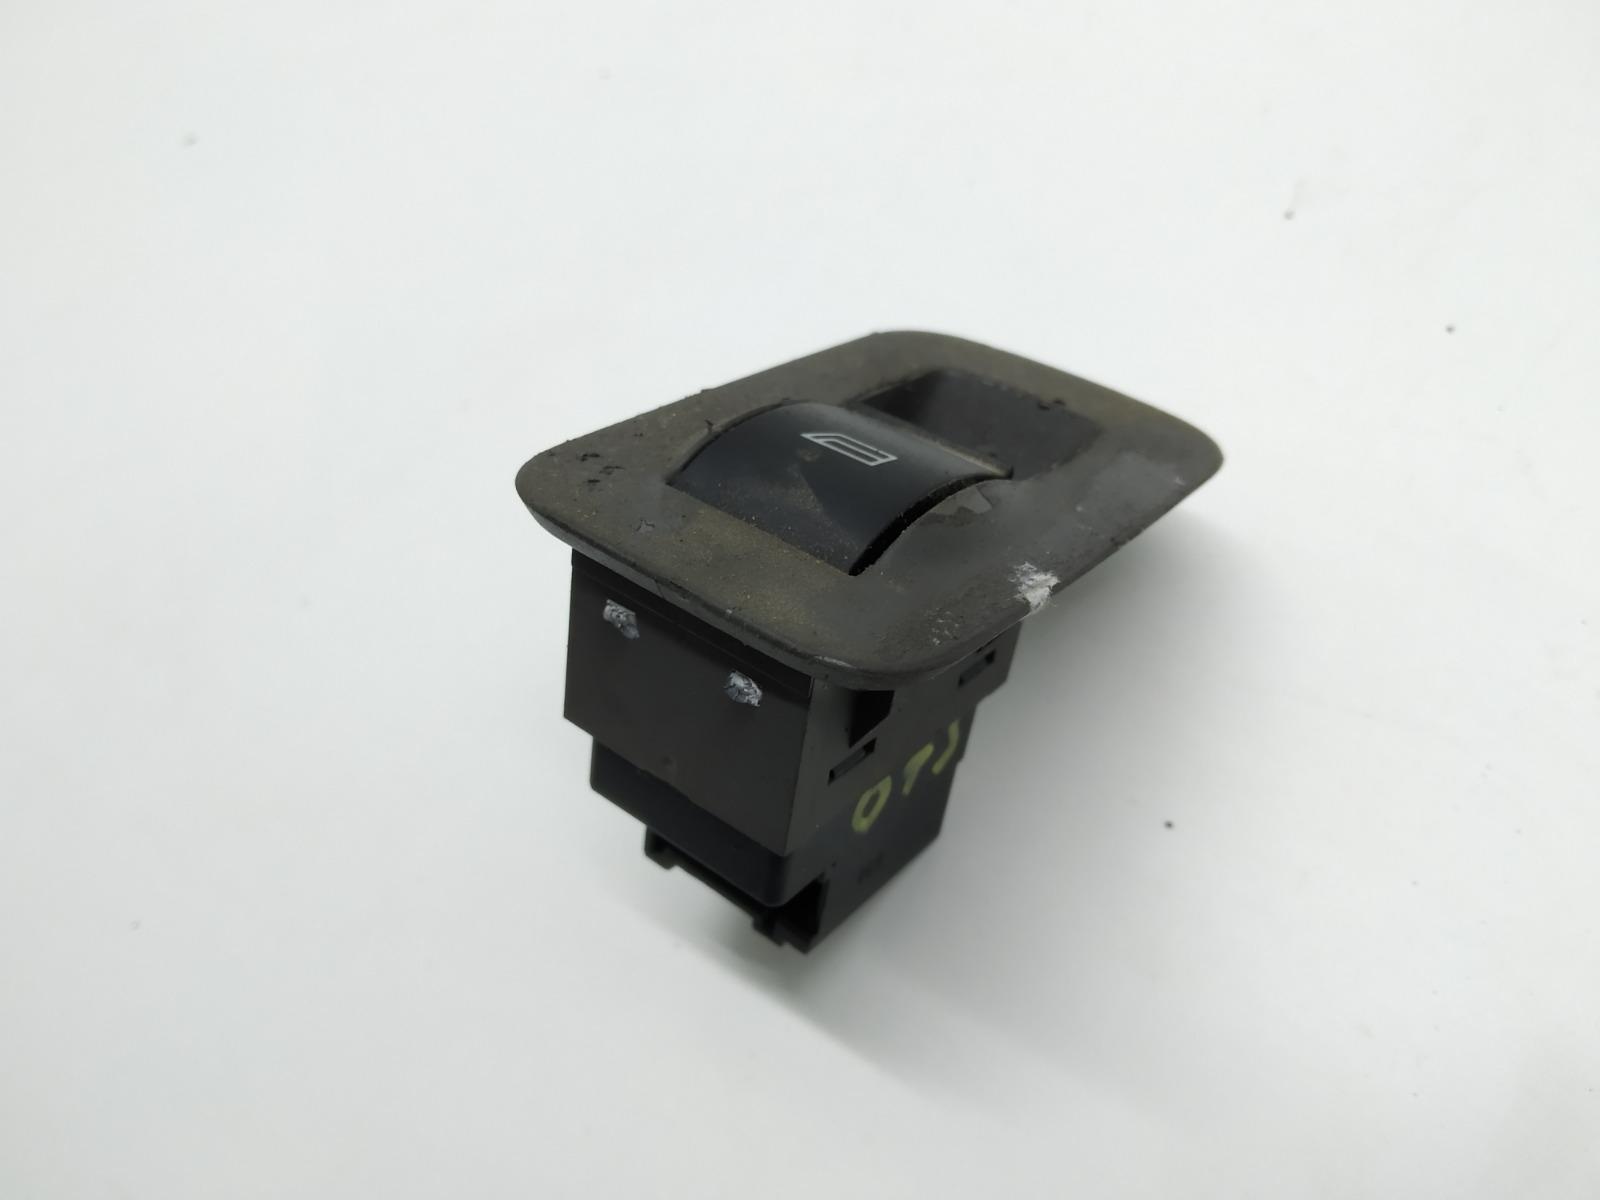 Кнопка стеклоподъемника Audi A2 8Z 1.4 I 2000 (б/у)